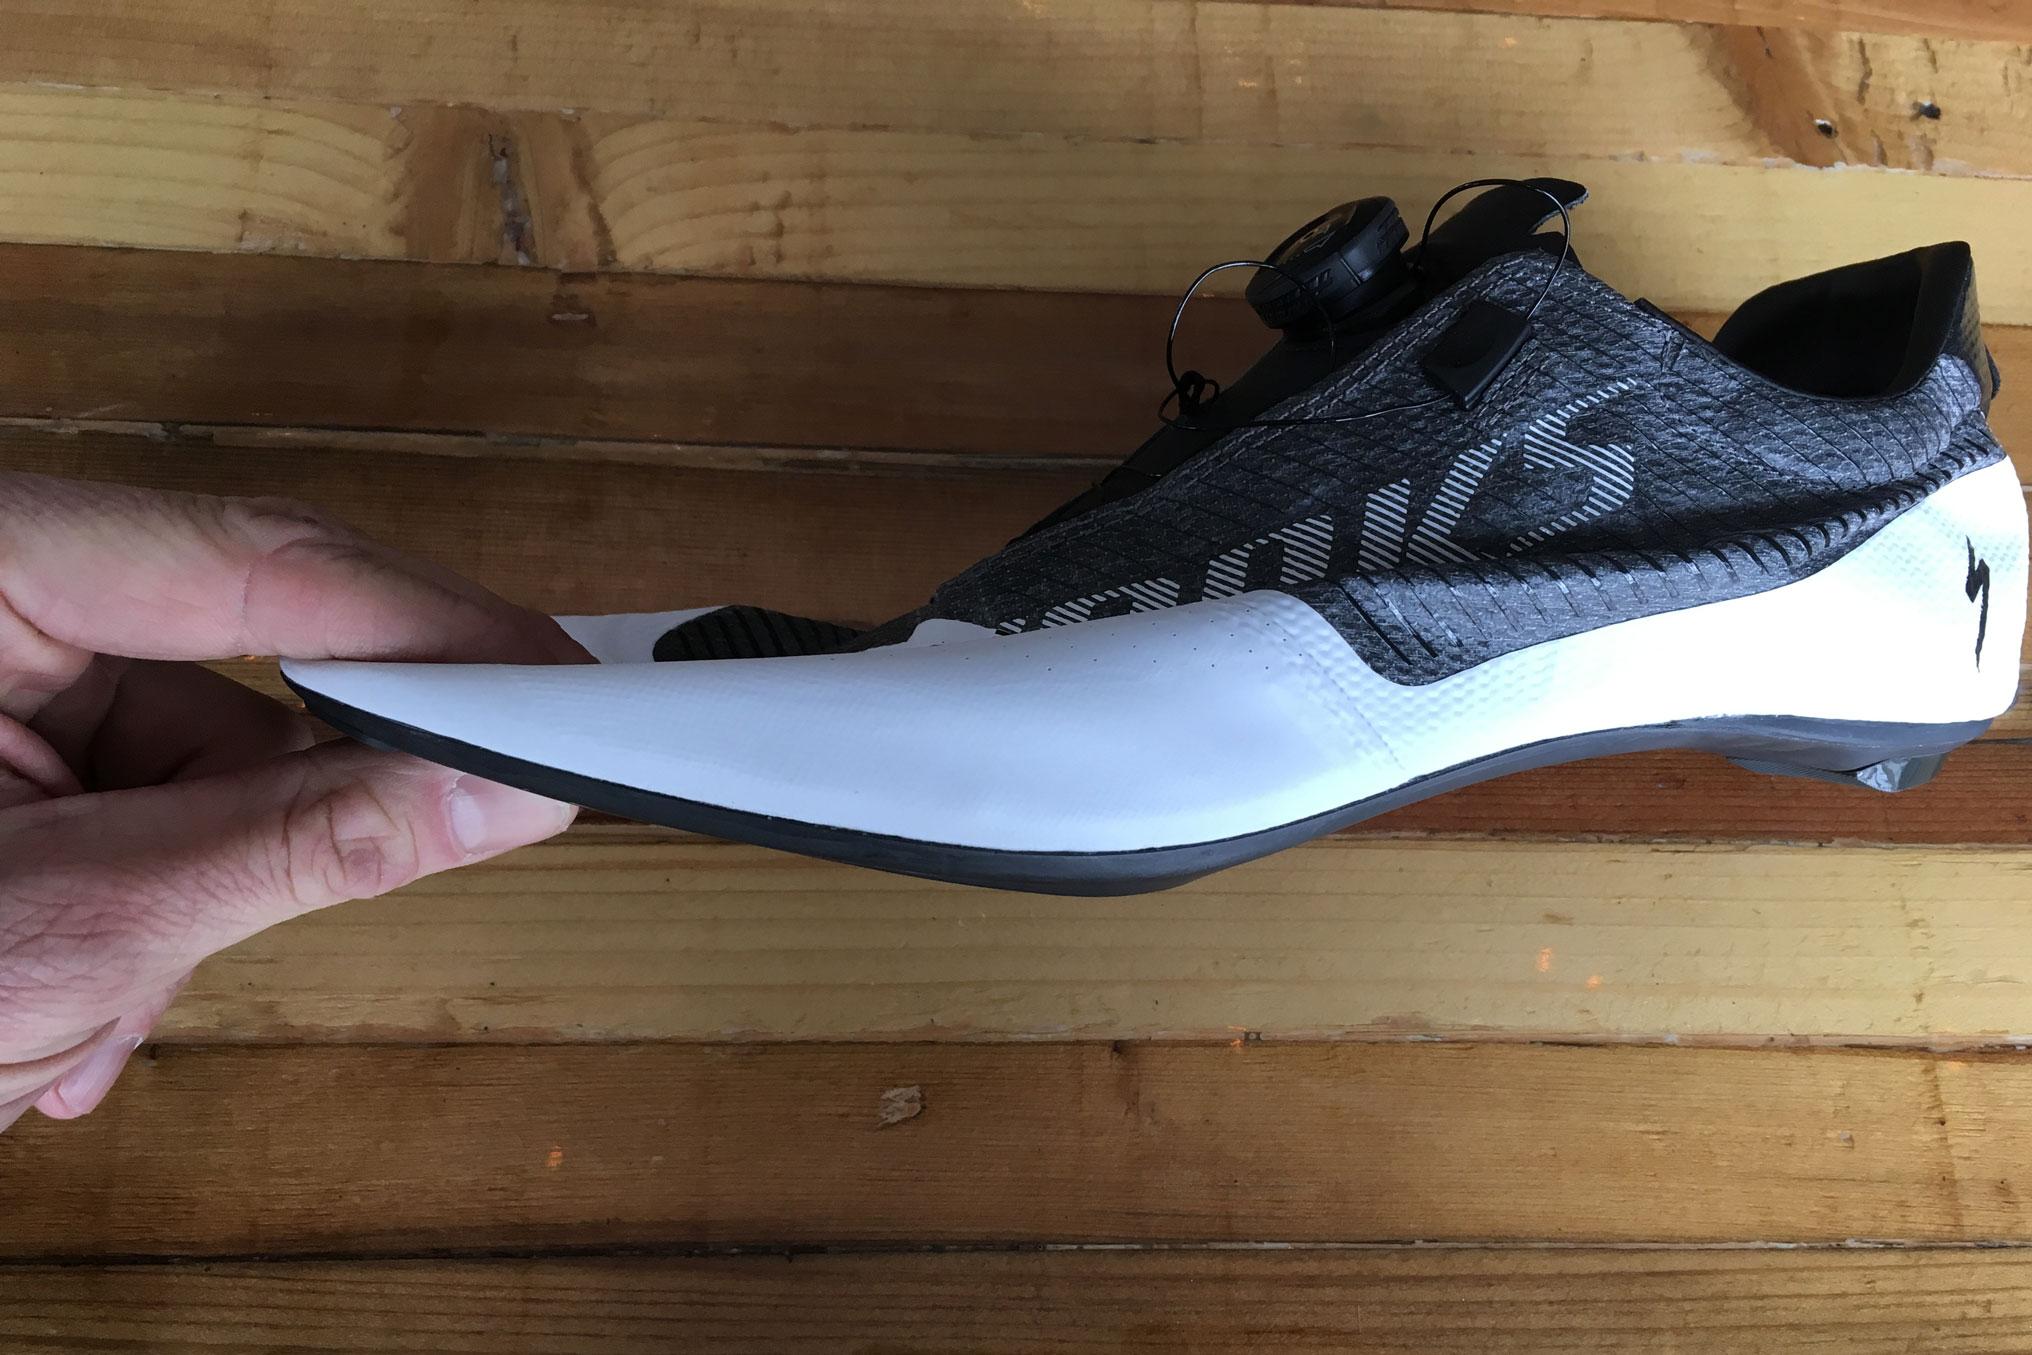 Specialized EXOS Dyneema road cycling shoe